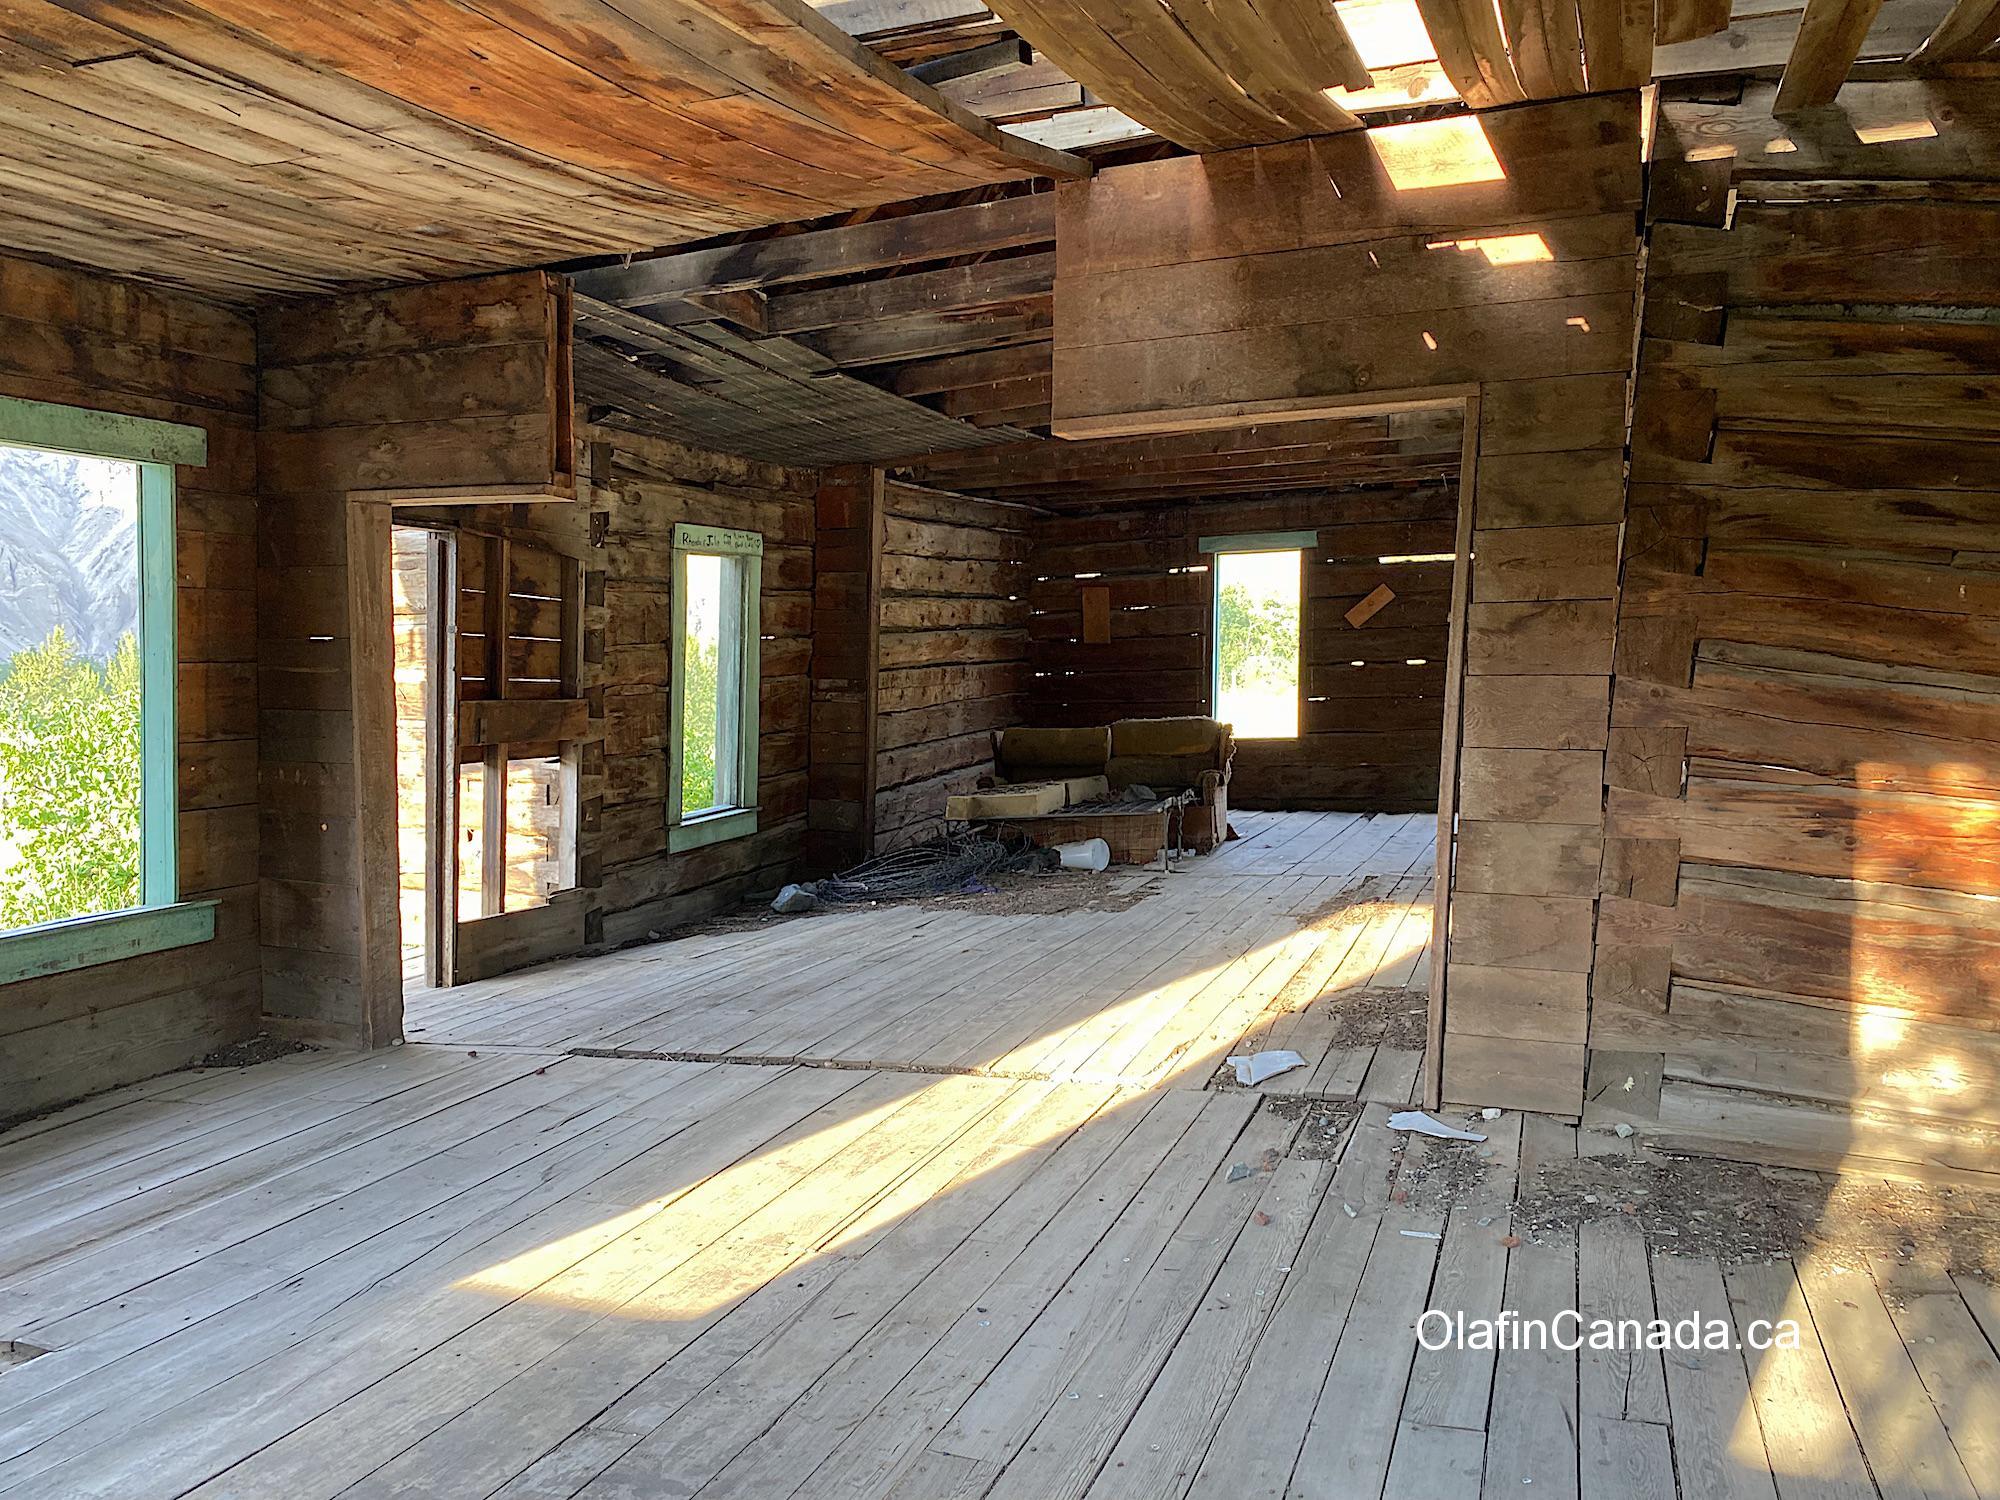 Interior of the log home at the Pothole Ranch with deserted sofa bed #olafincanada #britishcolumbia #discoverbc #abandonedbc #chilcotin #farwellcanyon #potholeranch #homestead